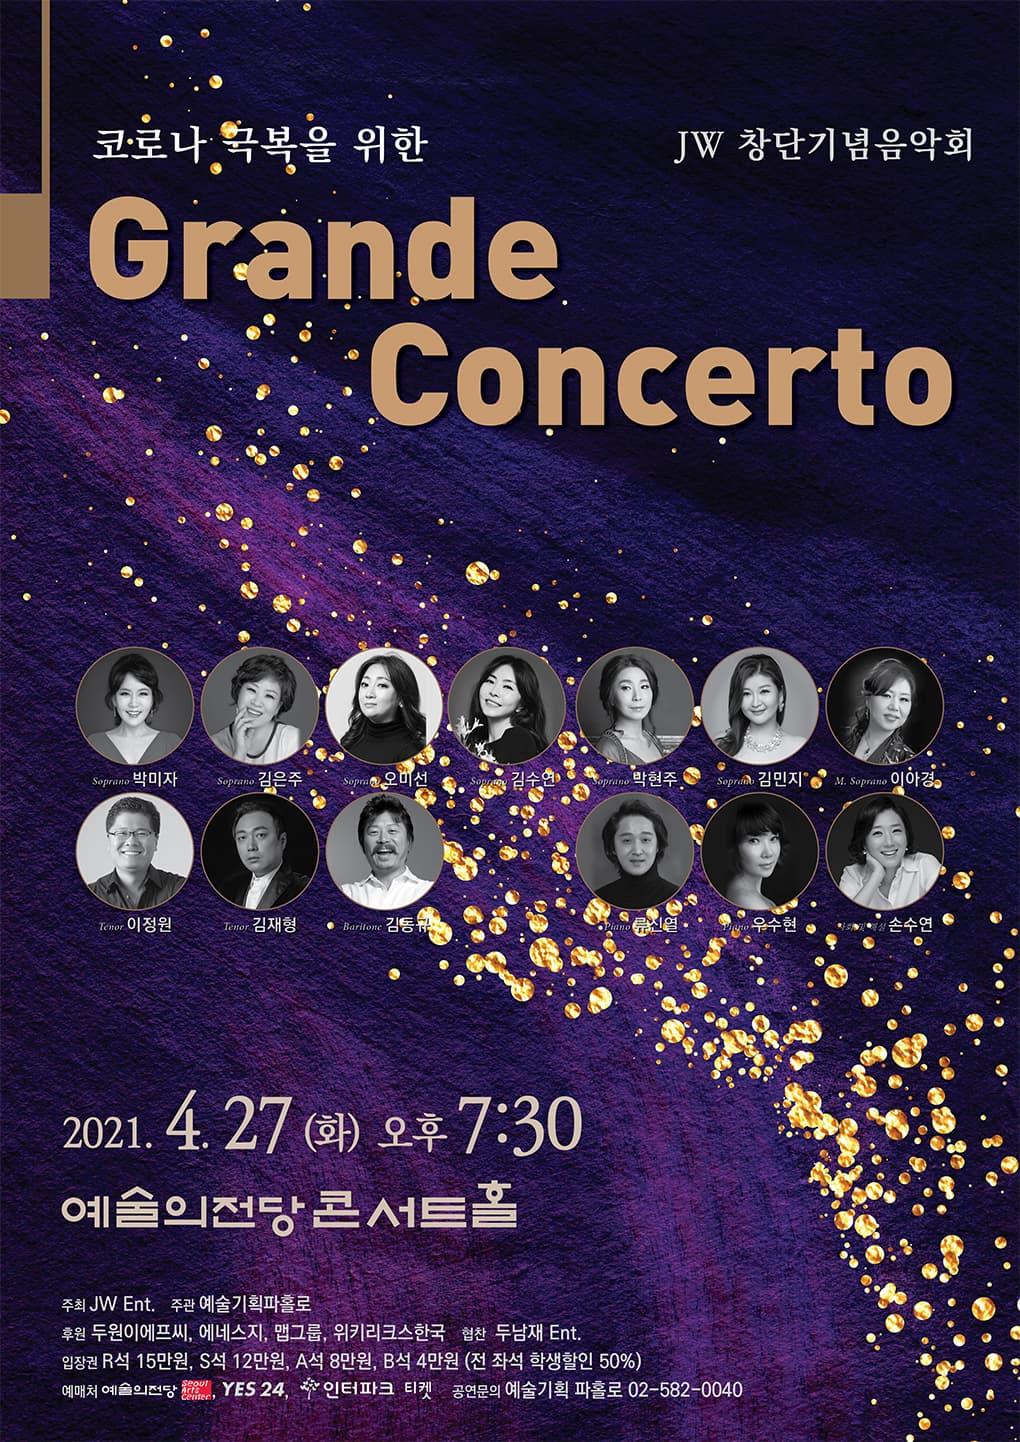 JW 창단기념음악회 Grande Concerto 2021/04/27(화) 19:30 예술의전당